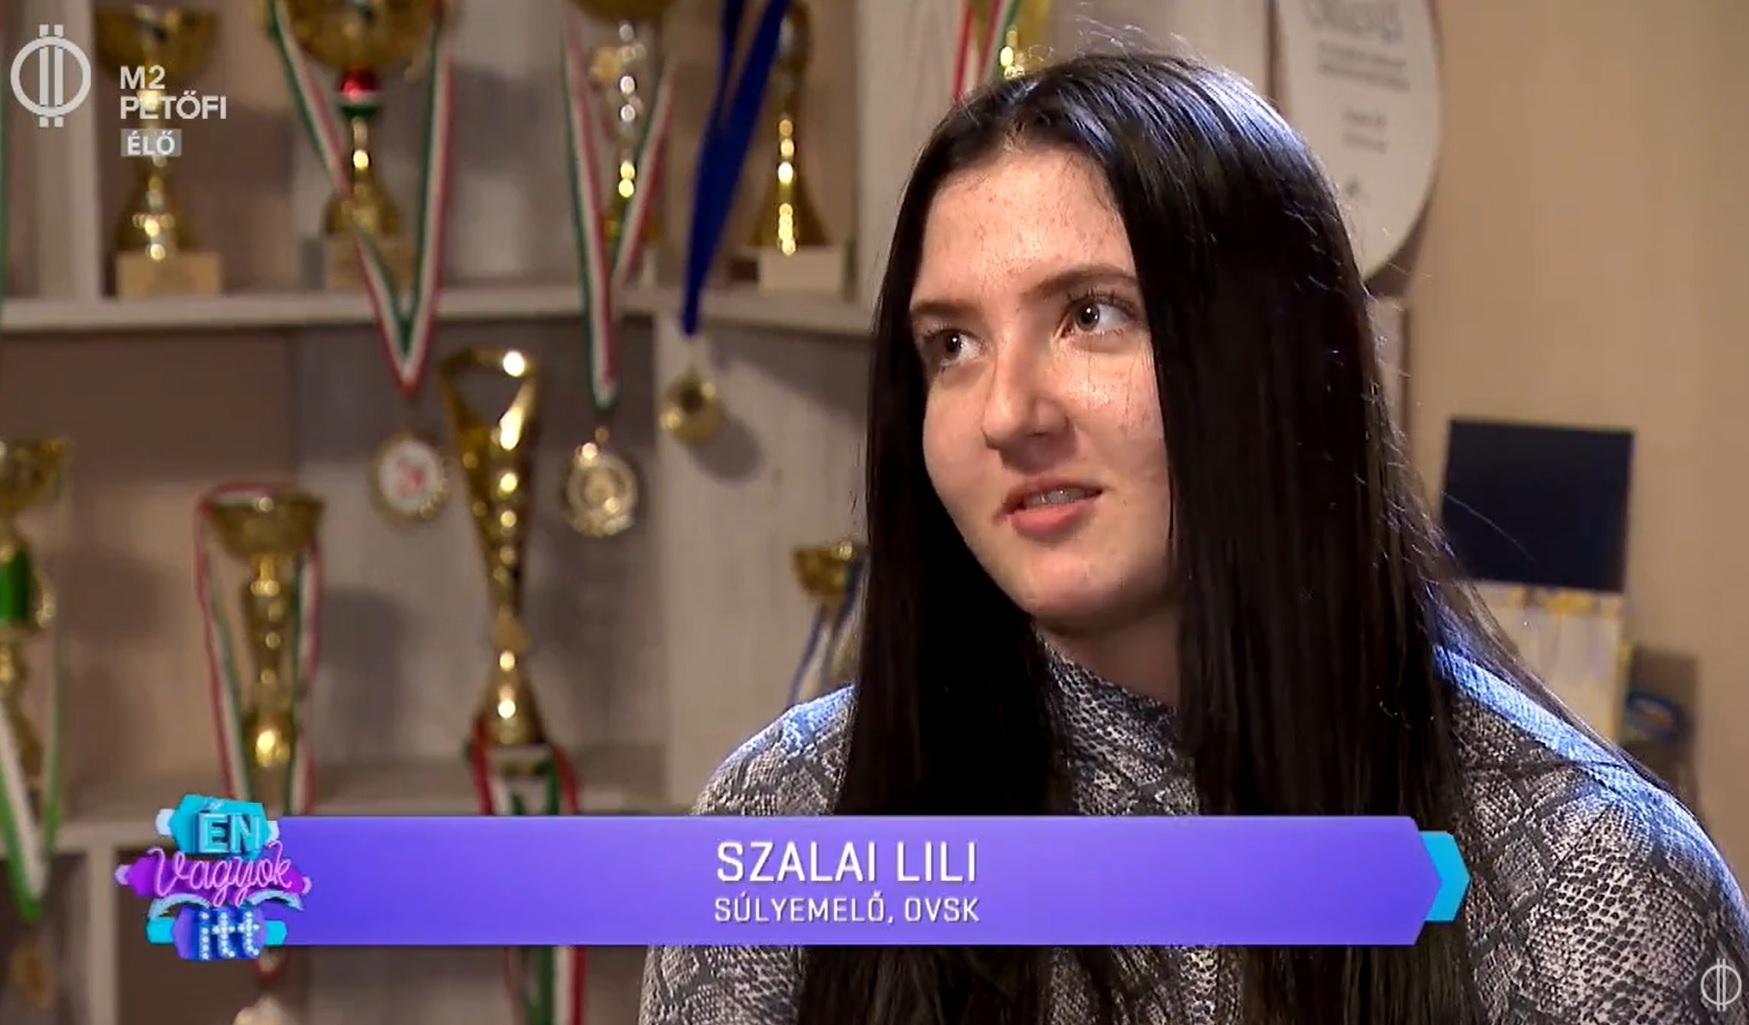 Szalai Lili